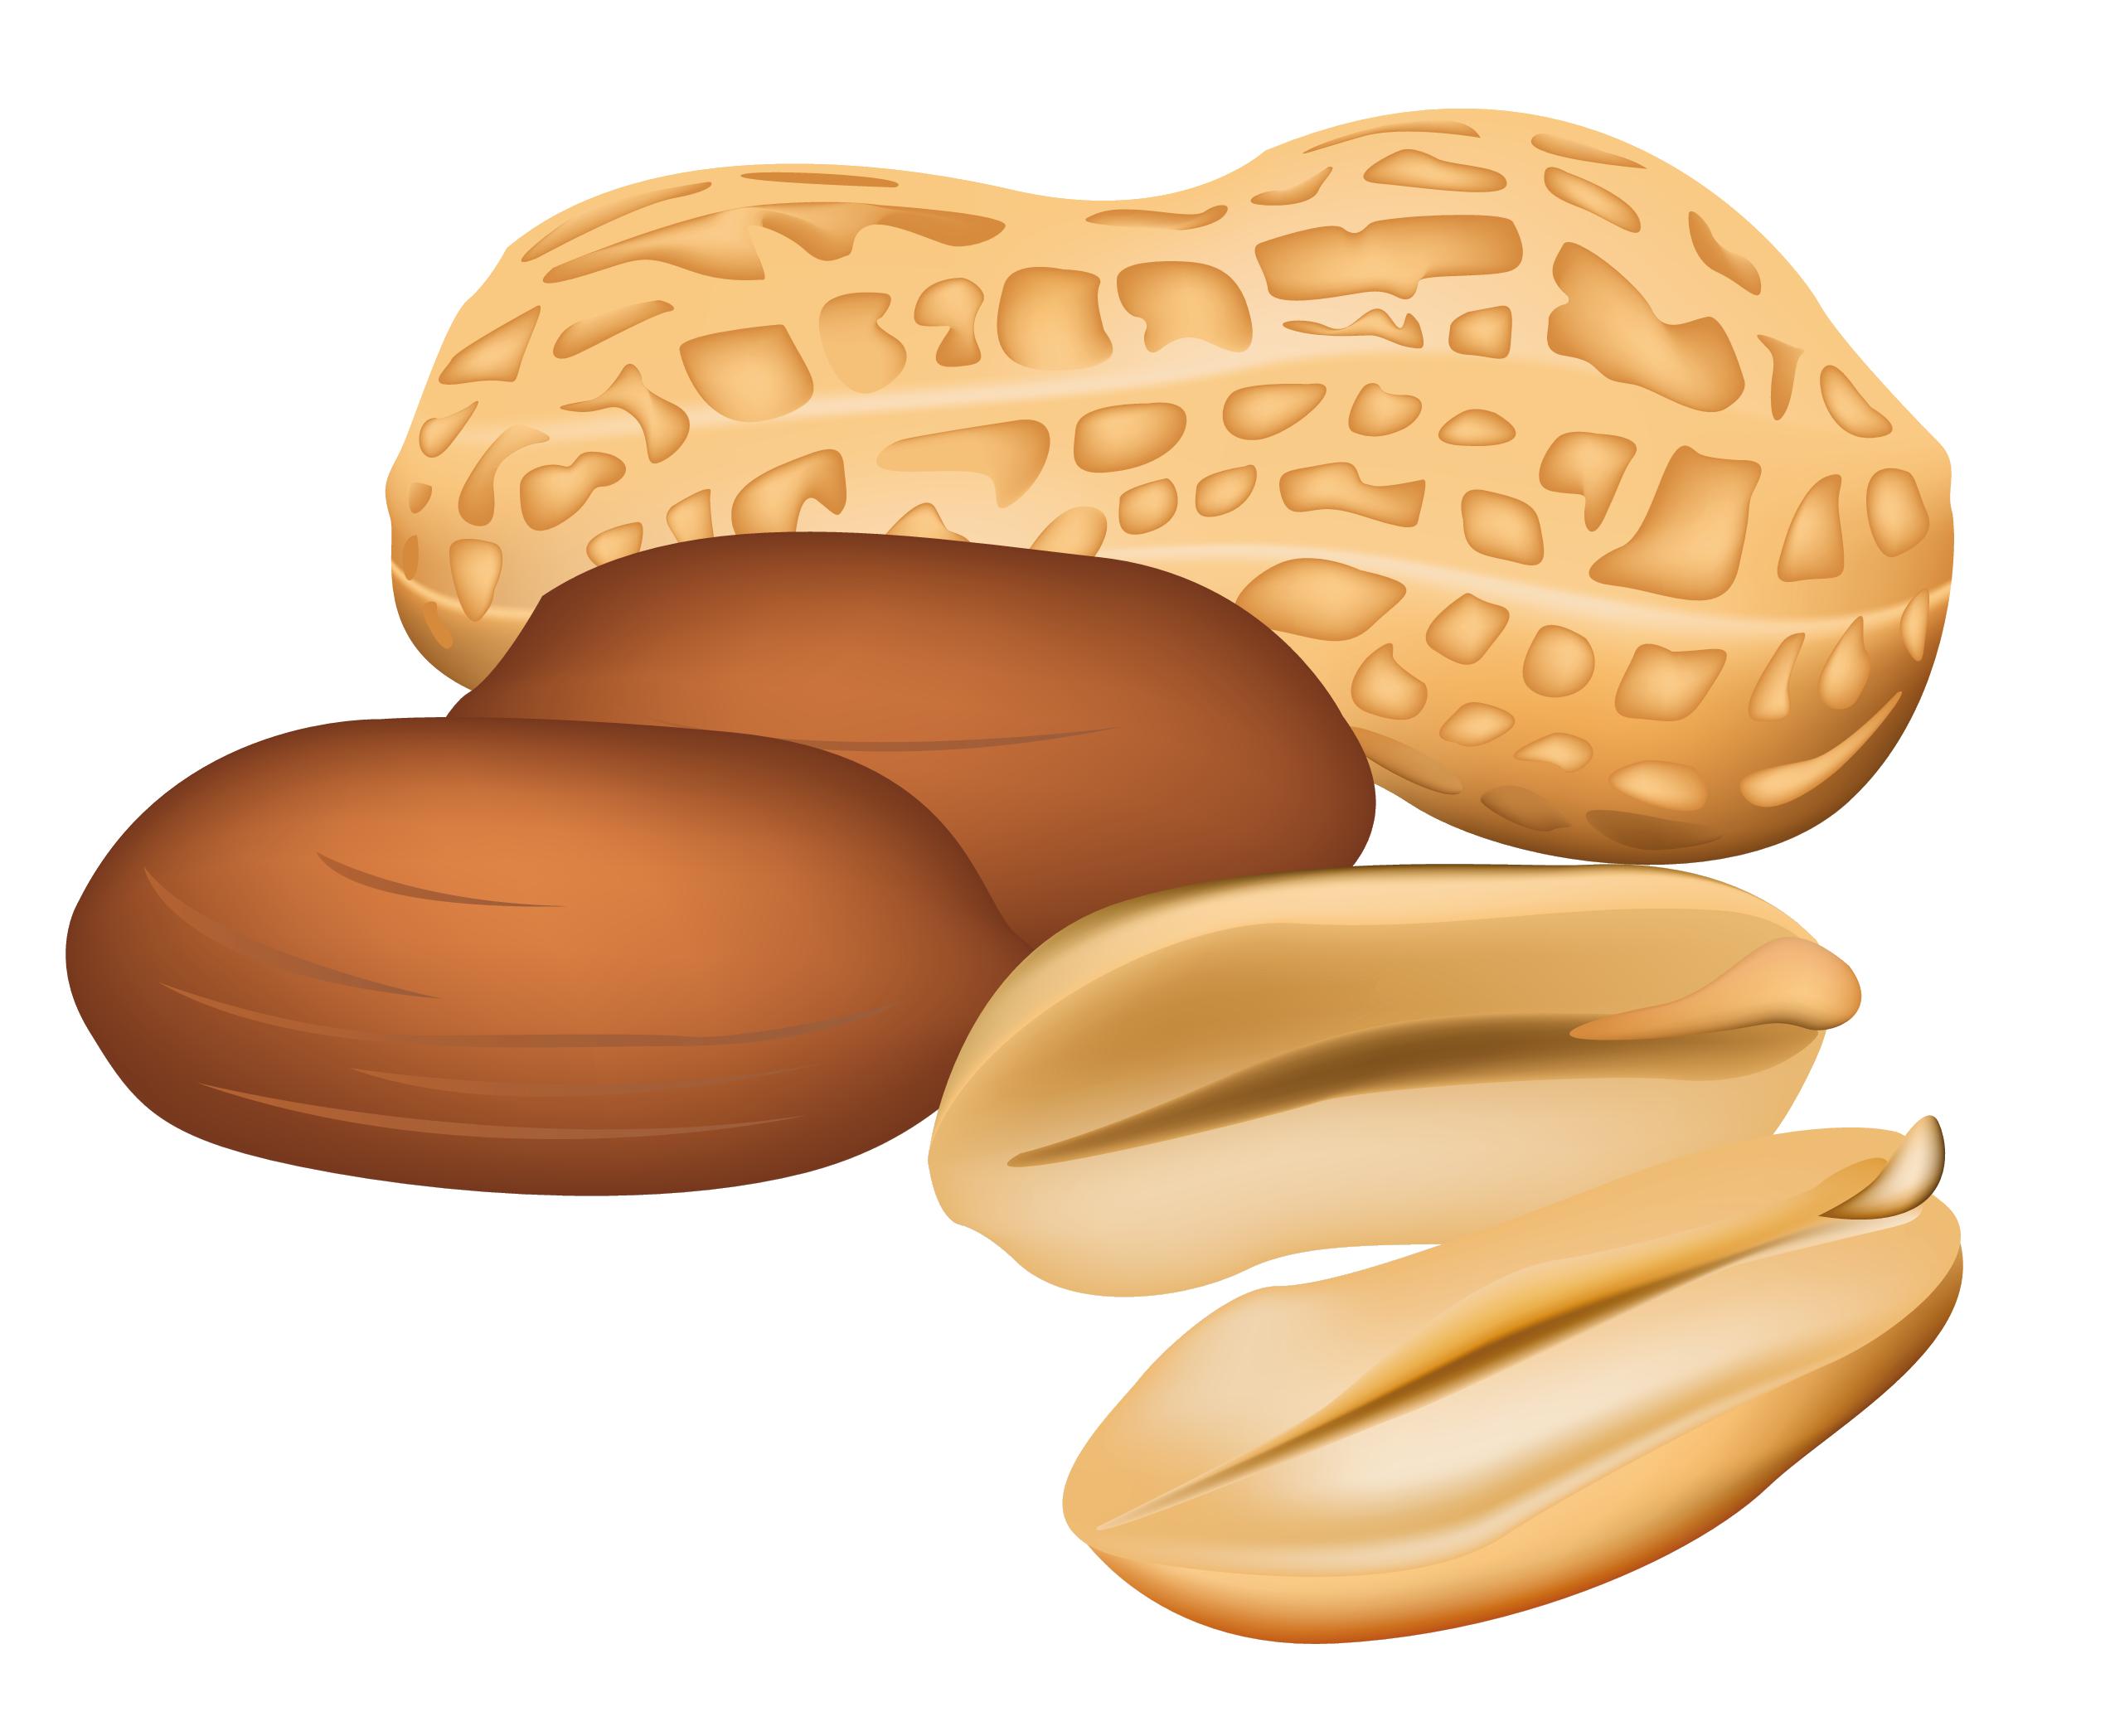 Free Peanut Cliparts, Download Free Clip Art, Free Clip Art.